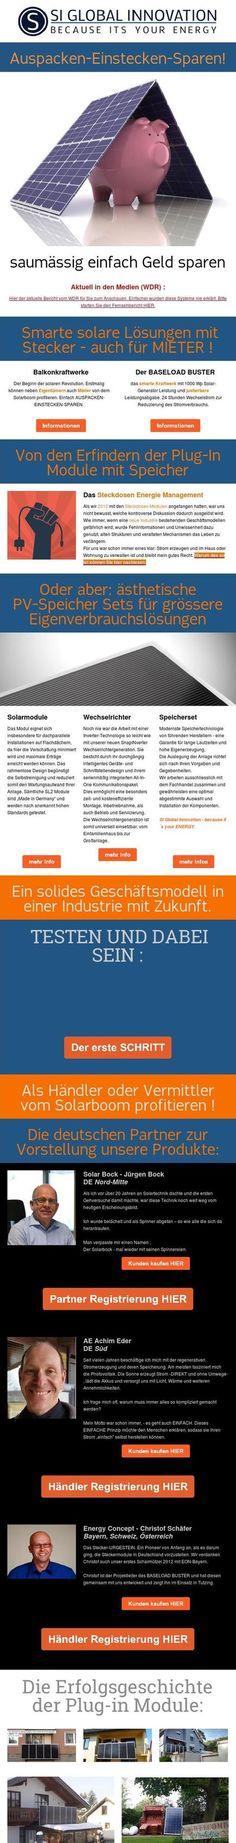 Great newsletter From SI Global Innovation http://cm.pn/17pr